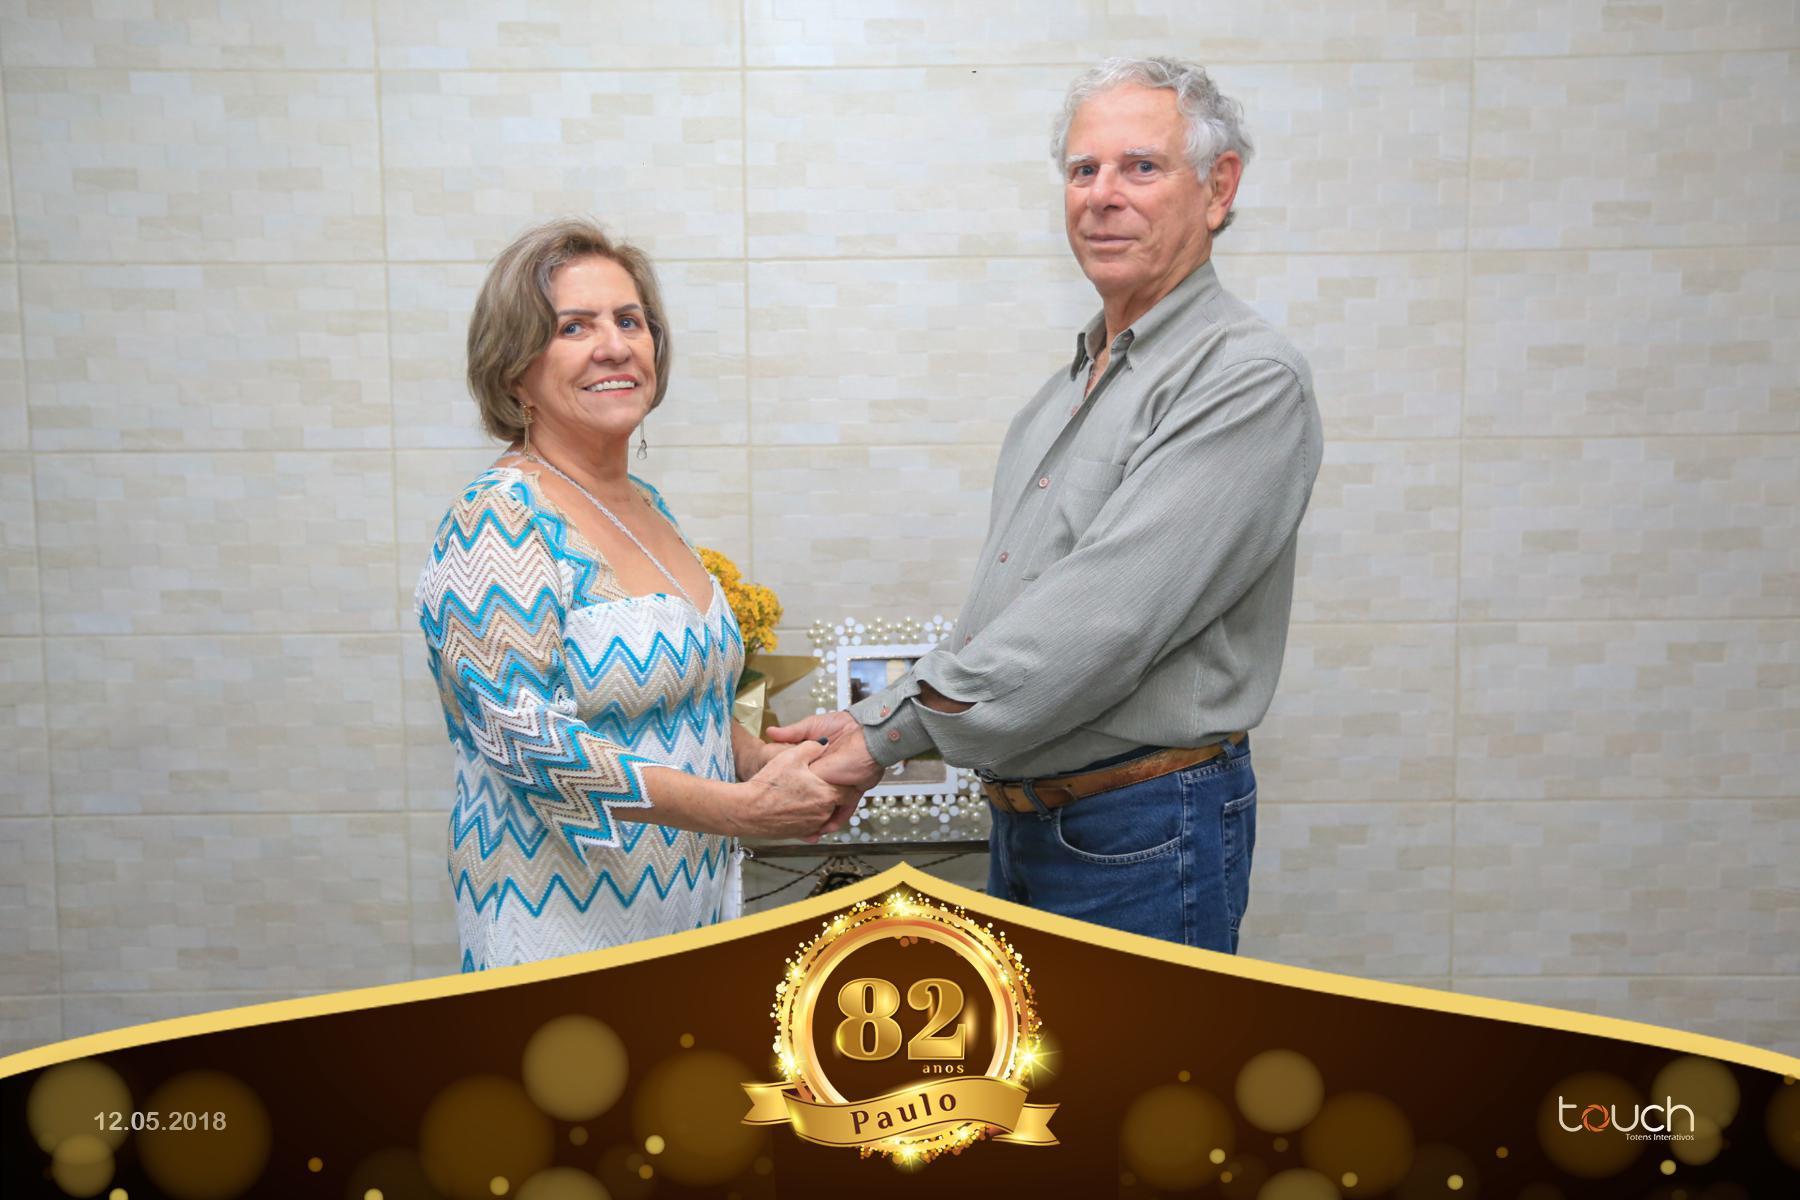 82 Anos Paulo